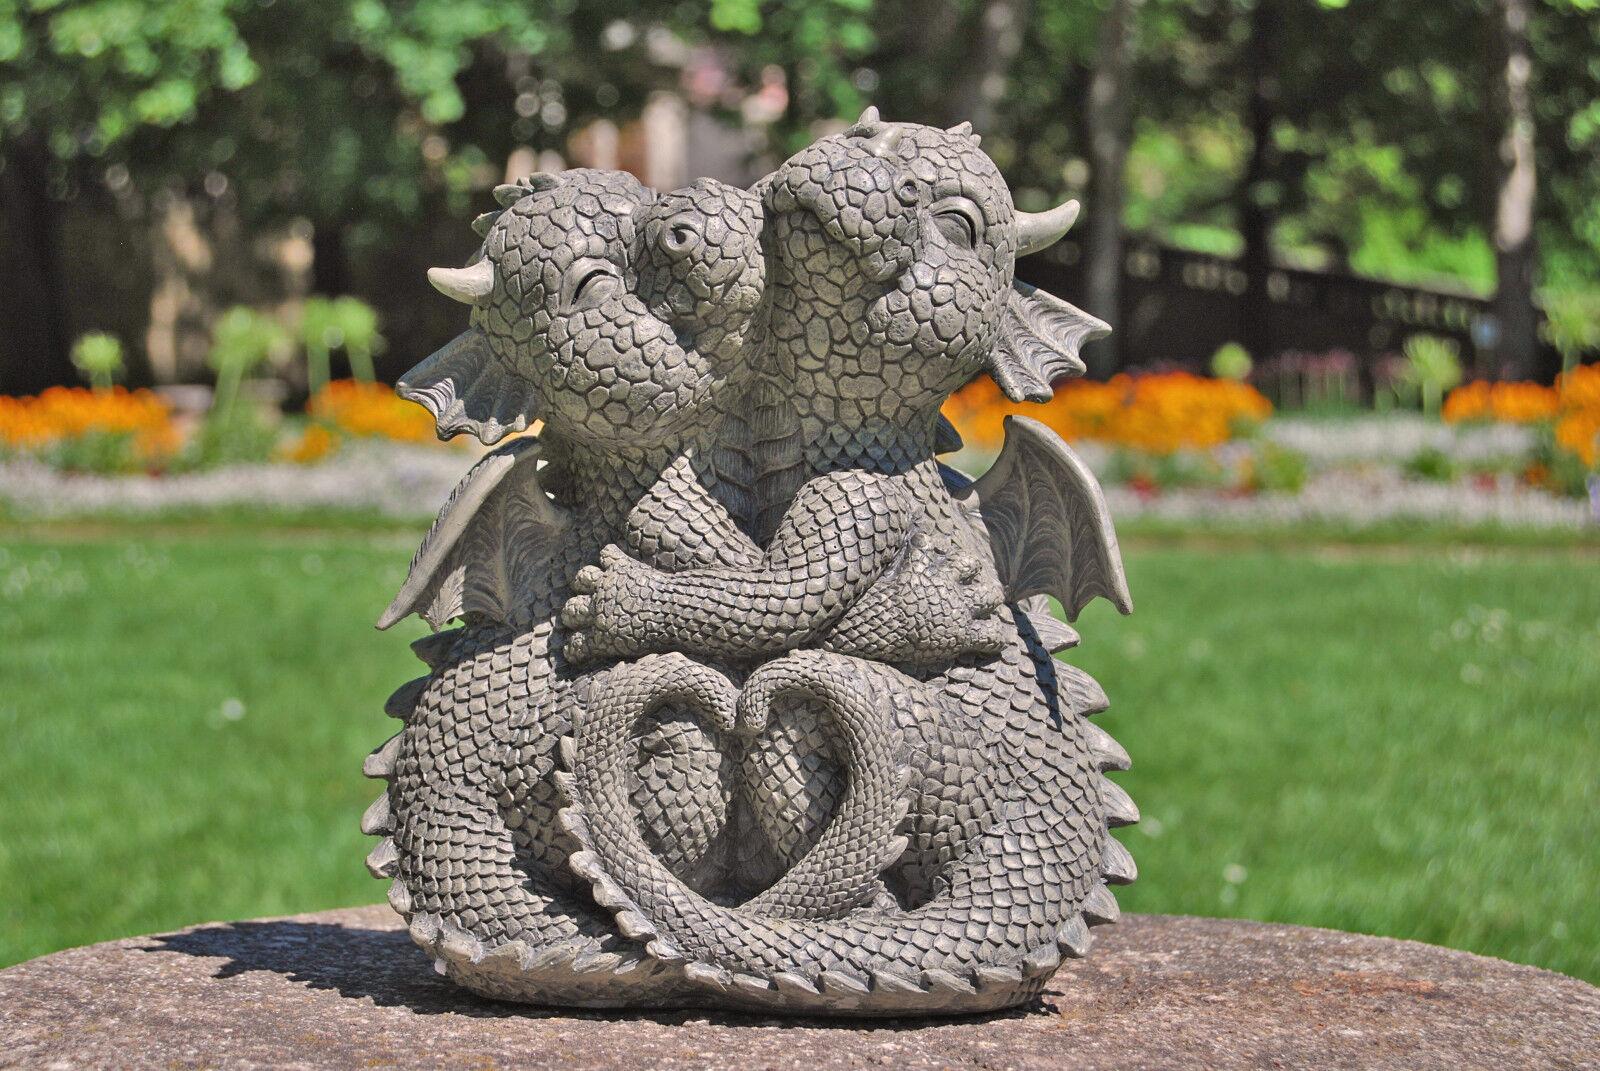 Drachen Gartendrachen, kuschelnd Süße Drachenfiguren Figuren Gargoyle Liebe Deko